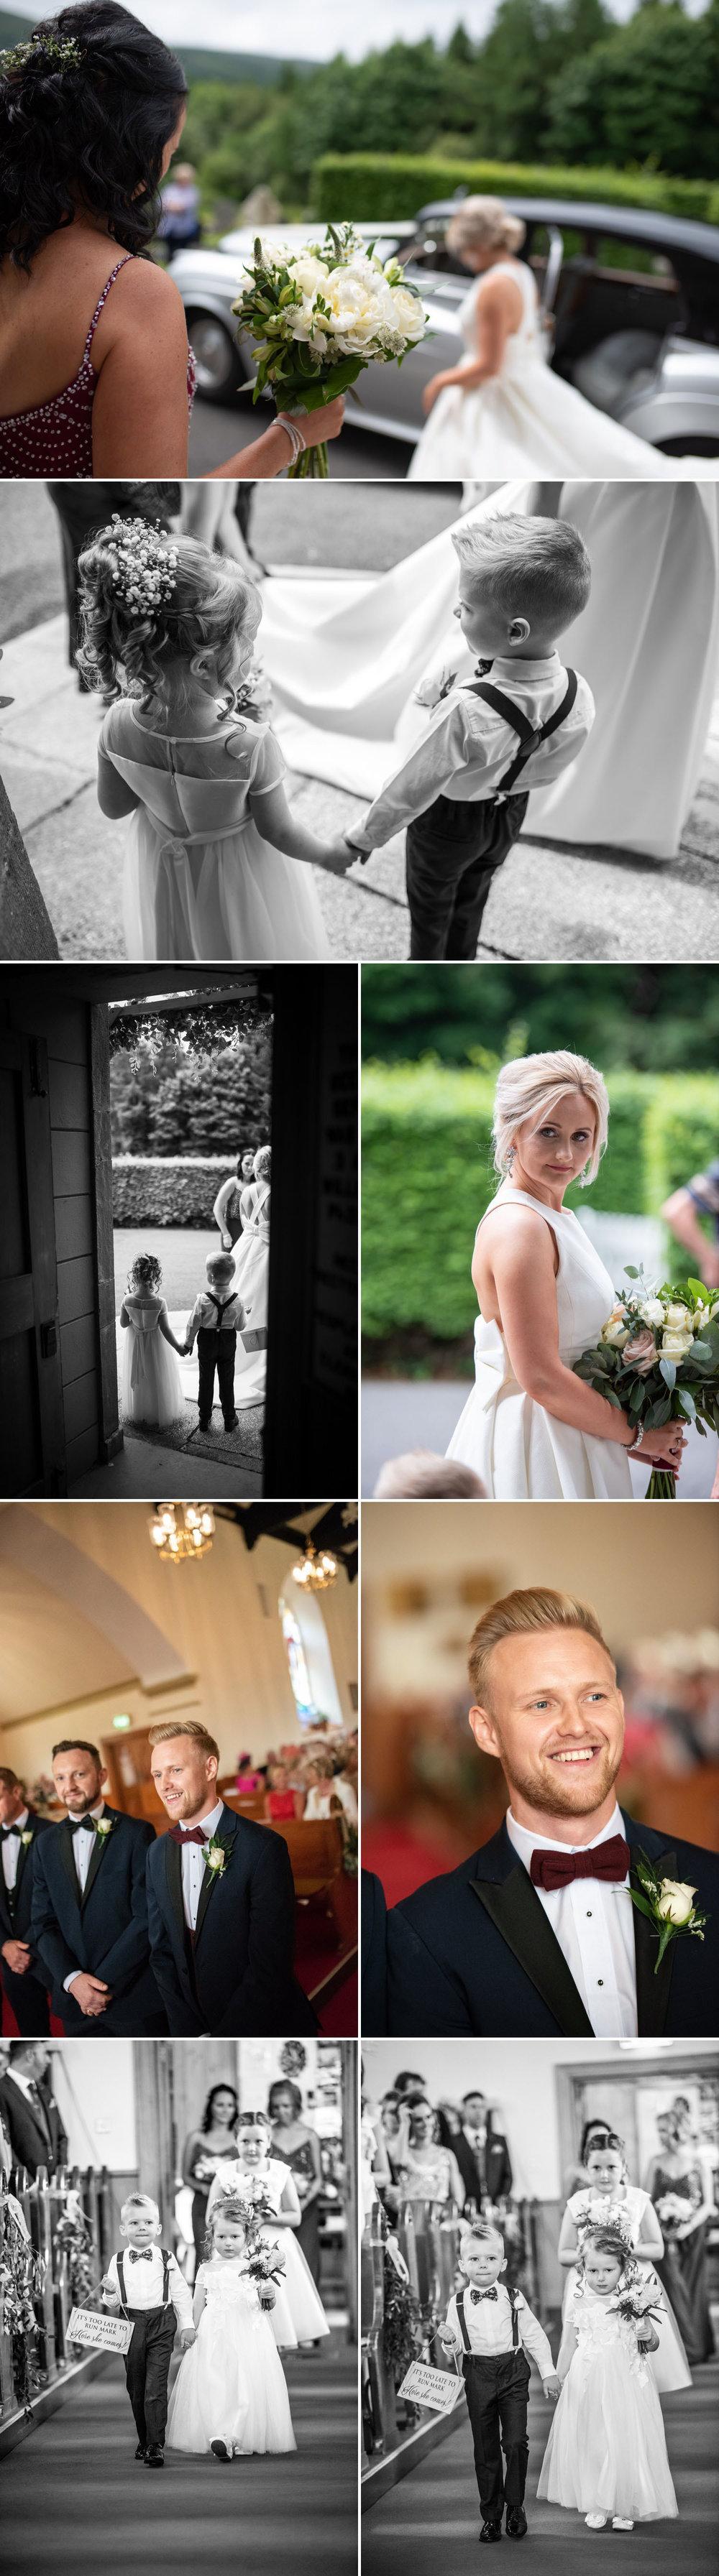 best wedding photographers northern ireland 06.jpg